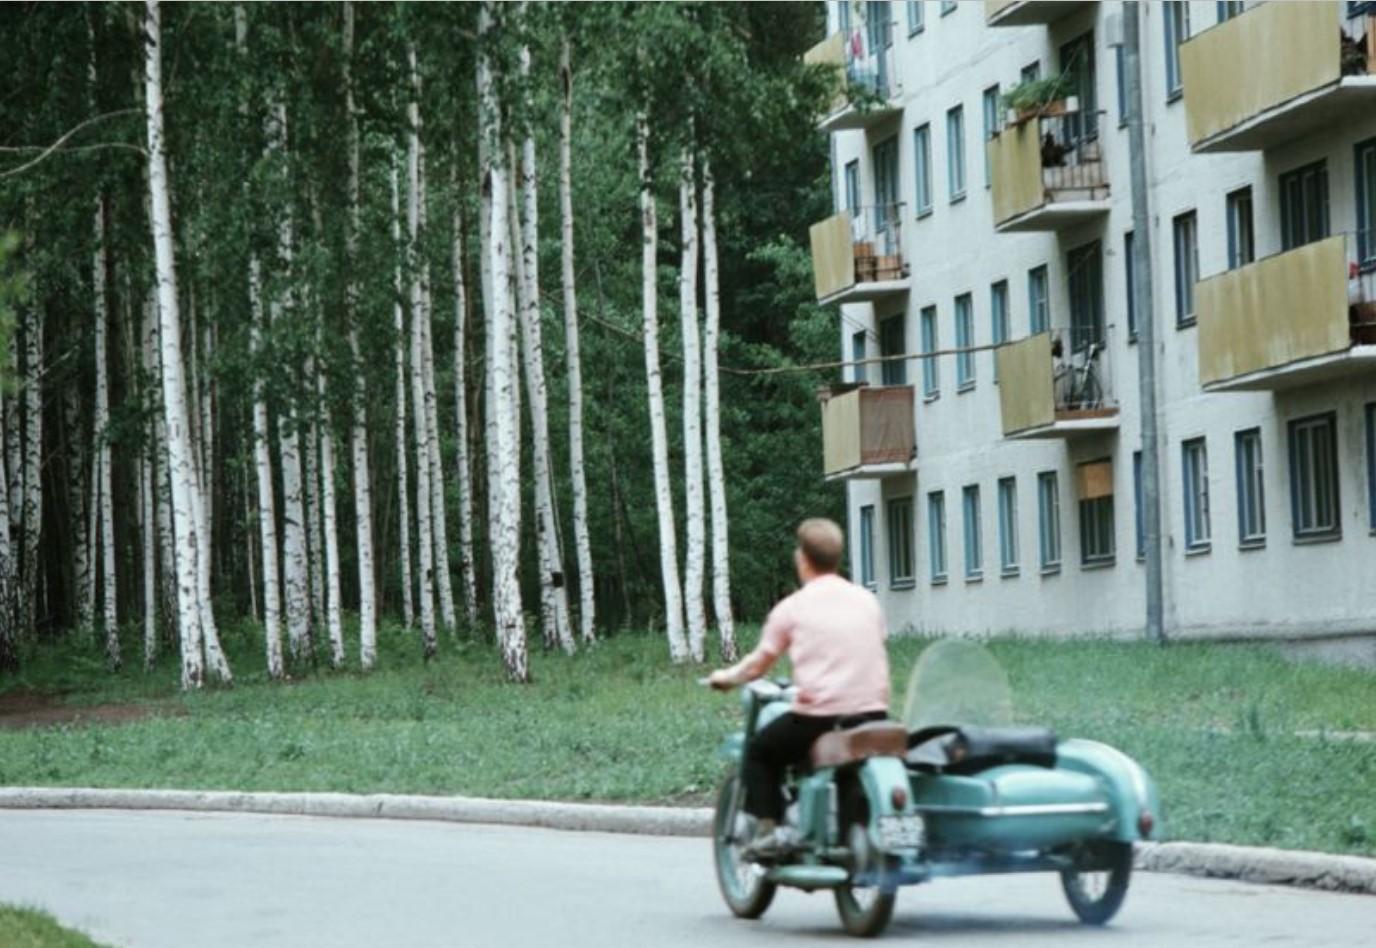 Мужчина на мотоцикле в спальном районе